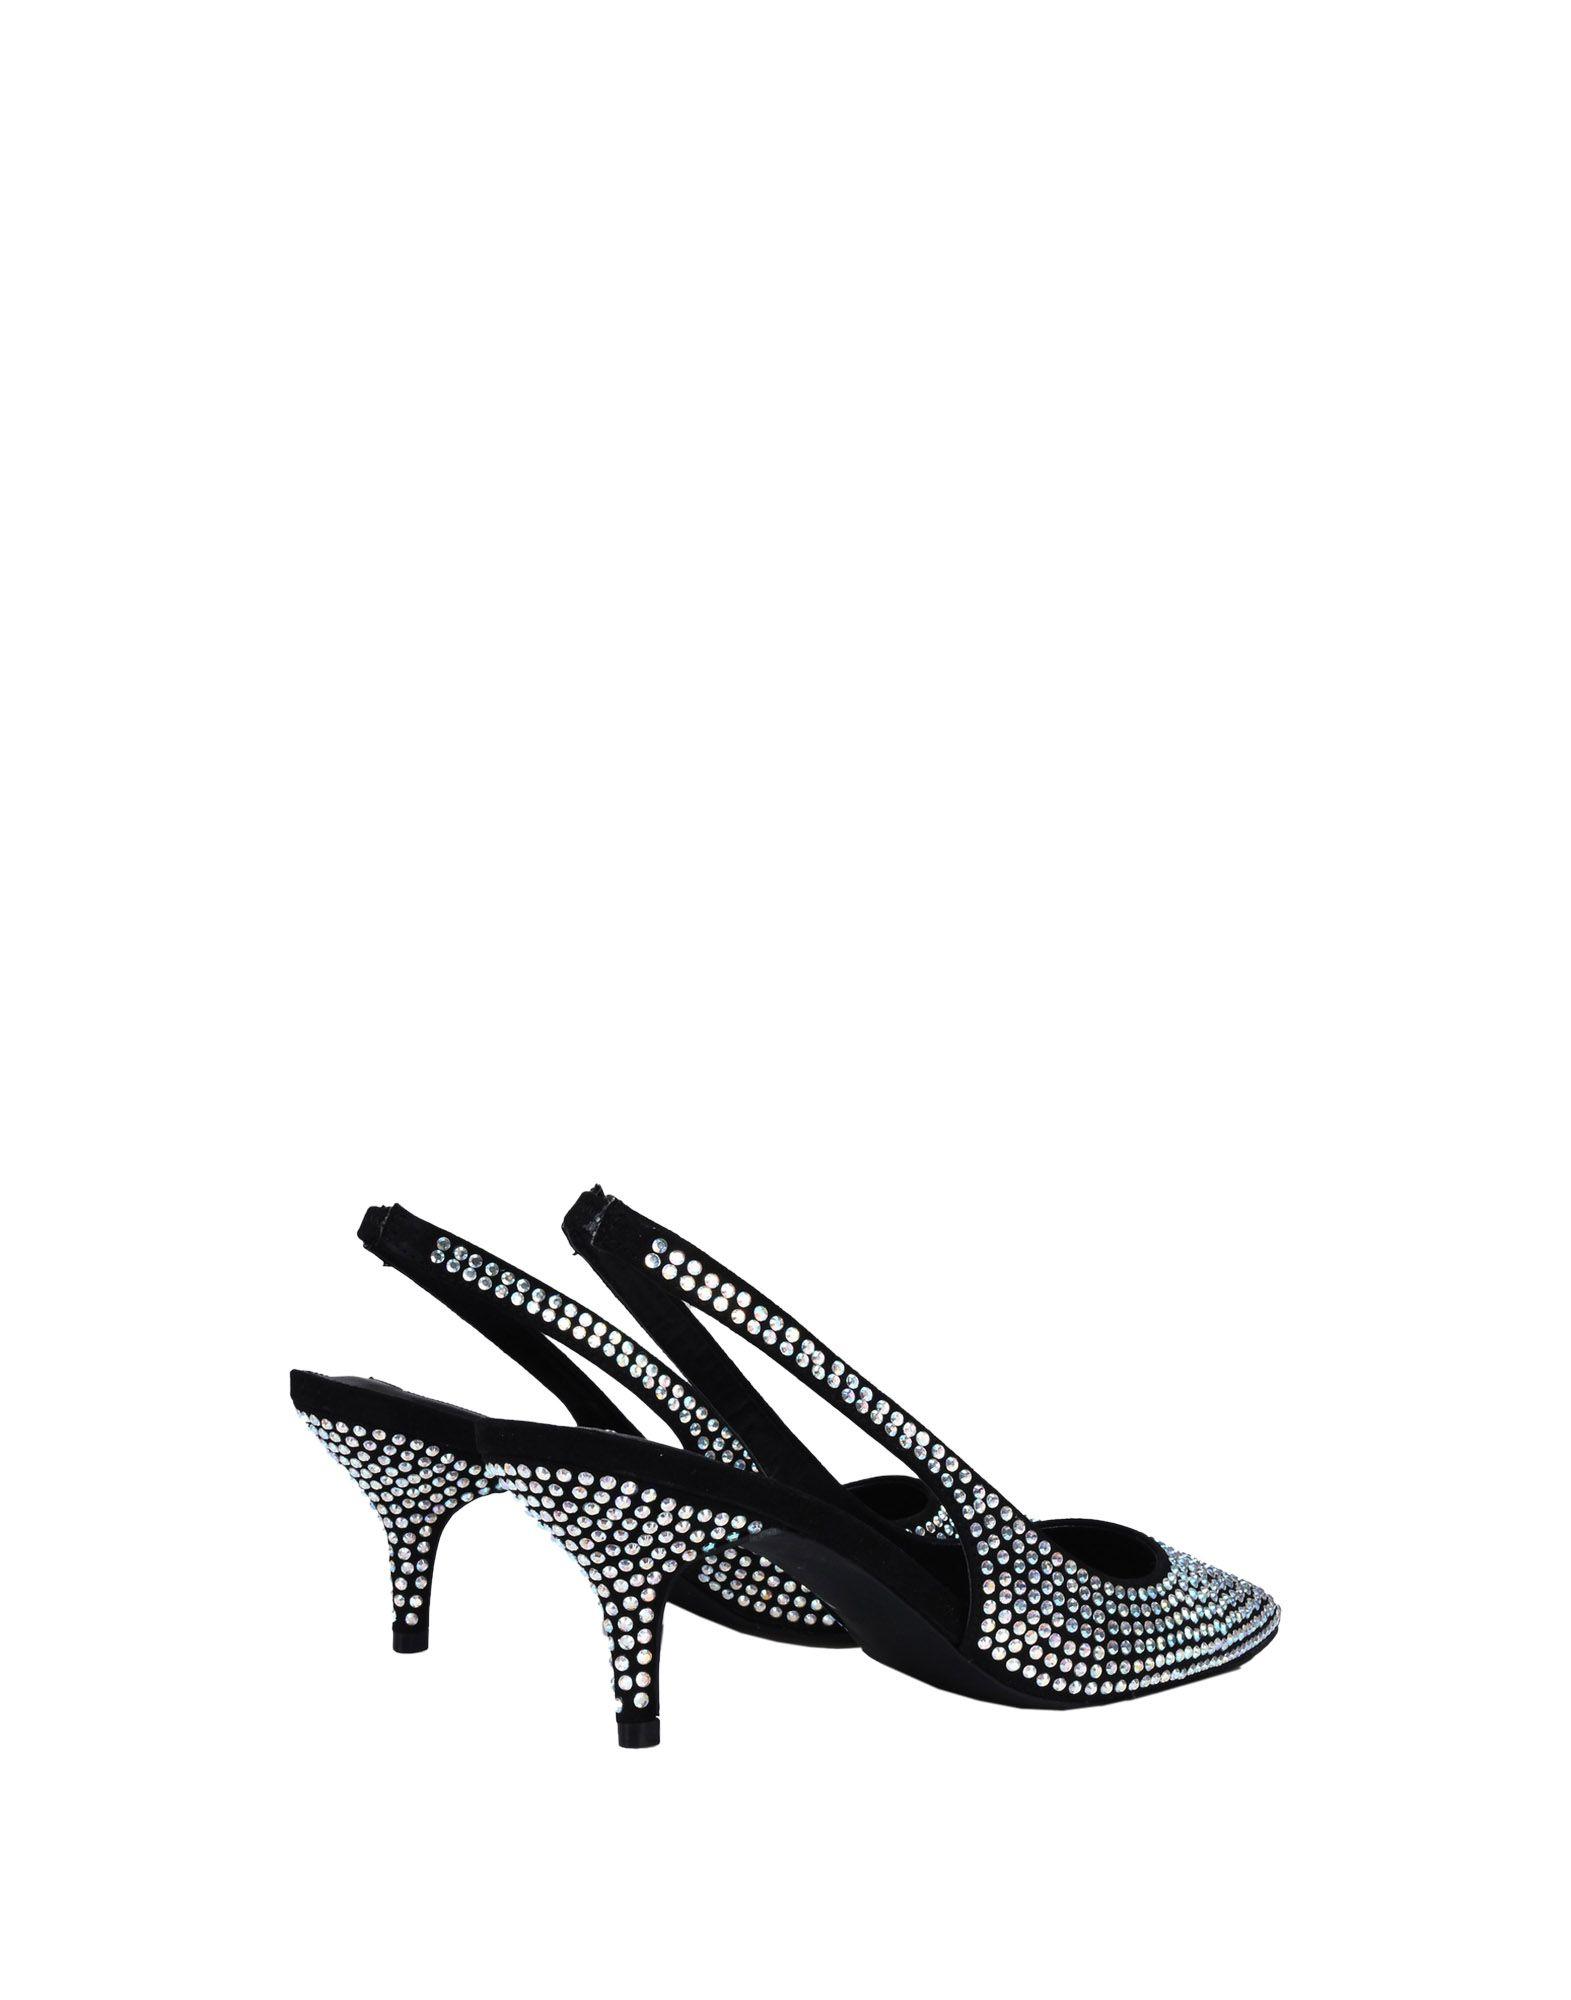 Steve Madden beliebte Marks 11492840VC Gute Qualität beliebte Madden Schuhe daf220